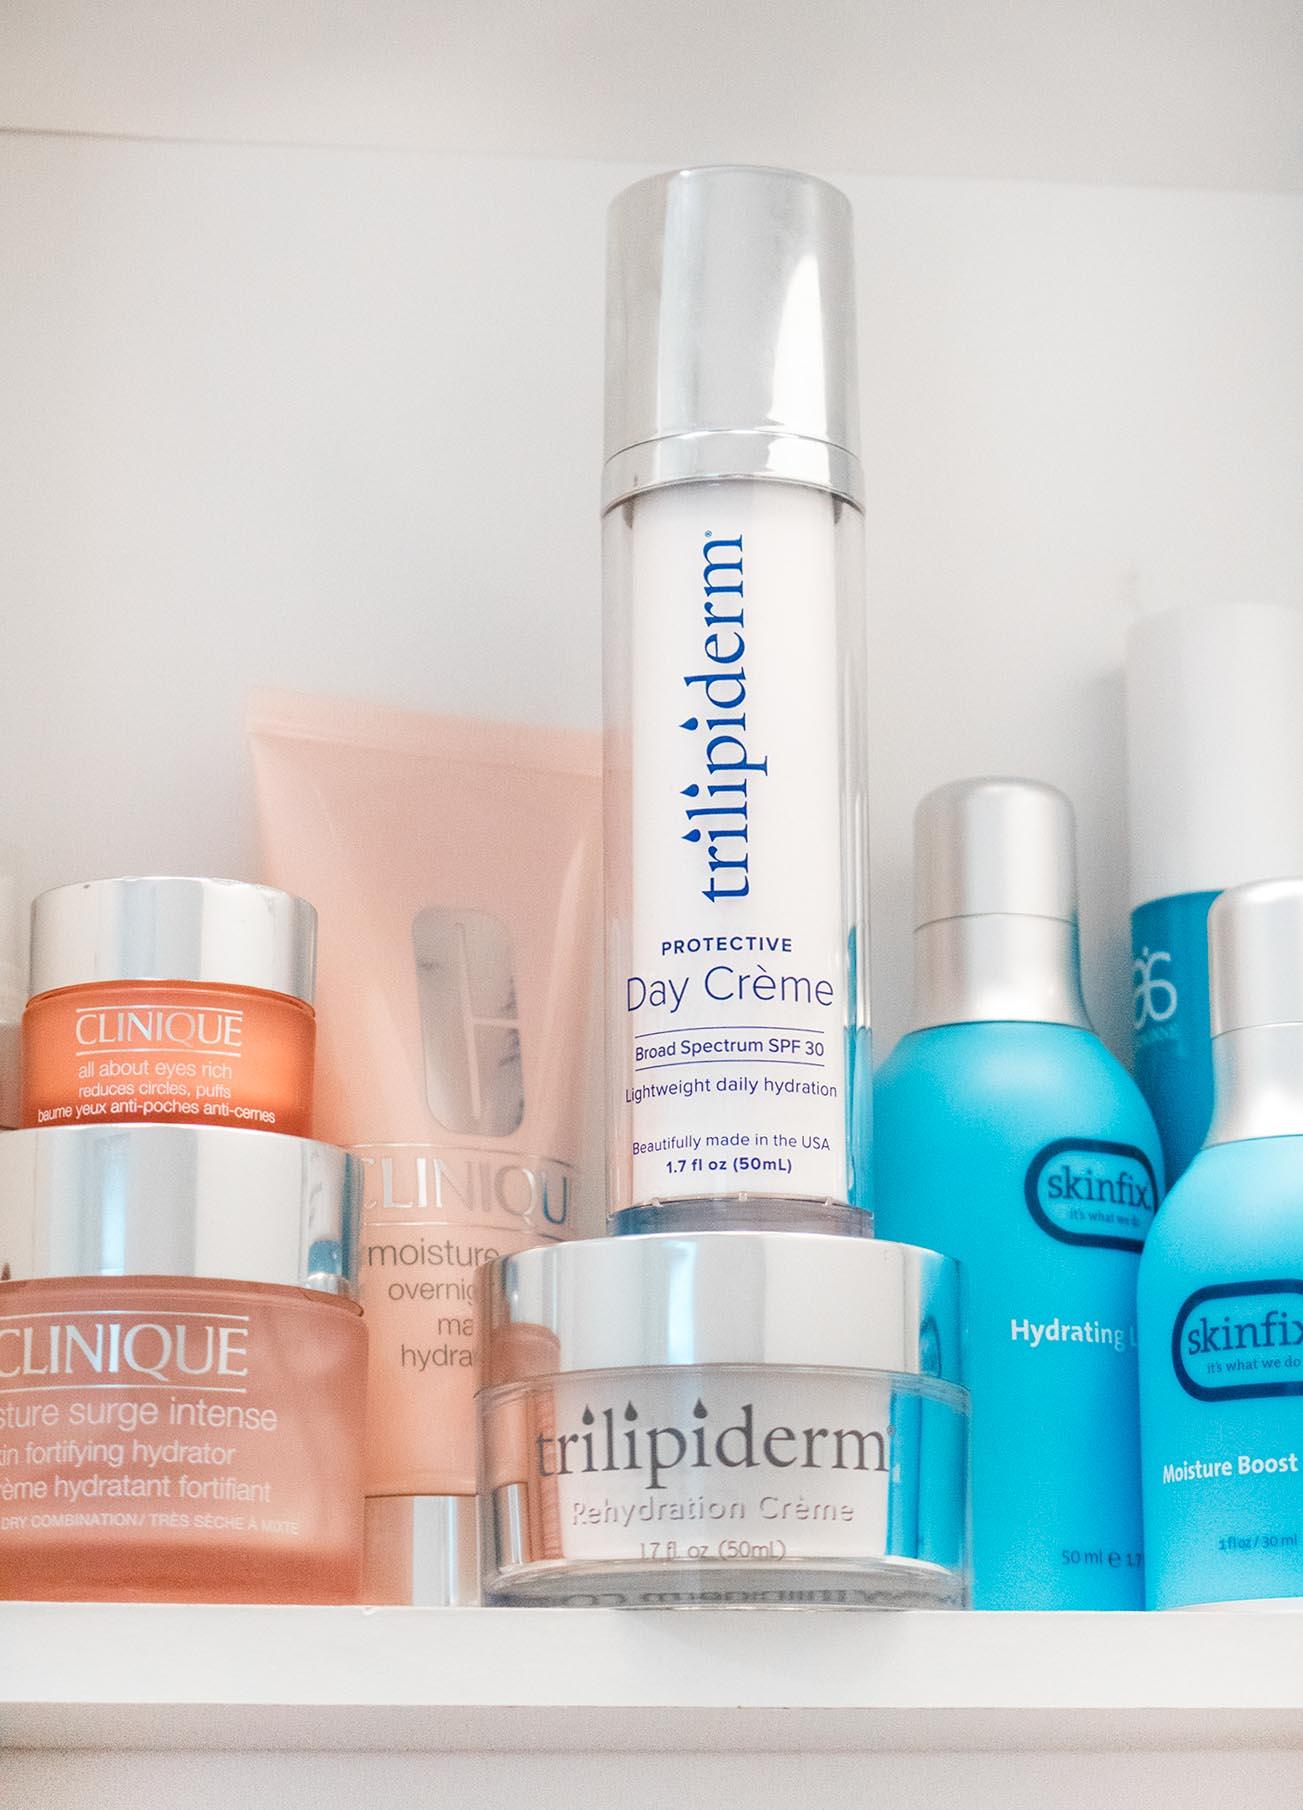 Trilipiderm skincare products